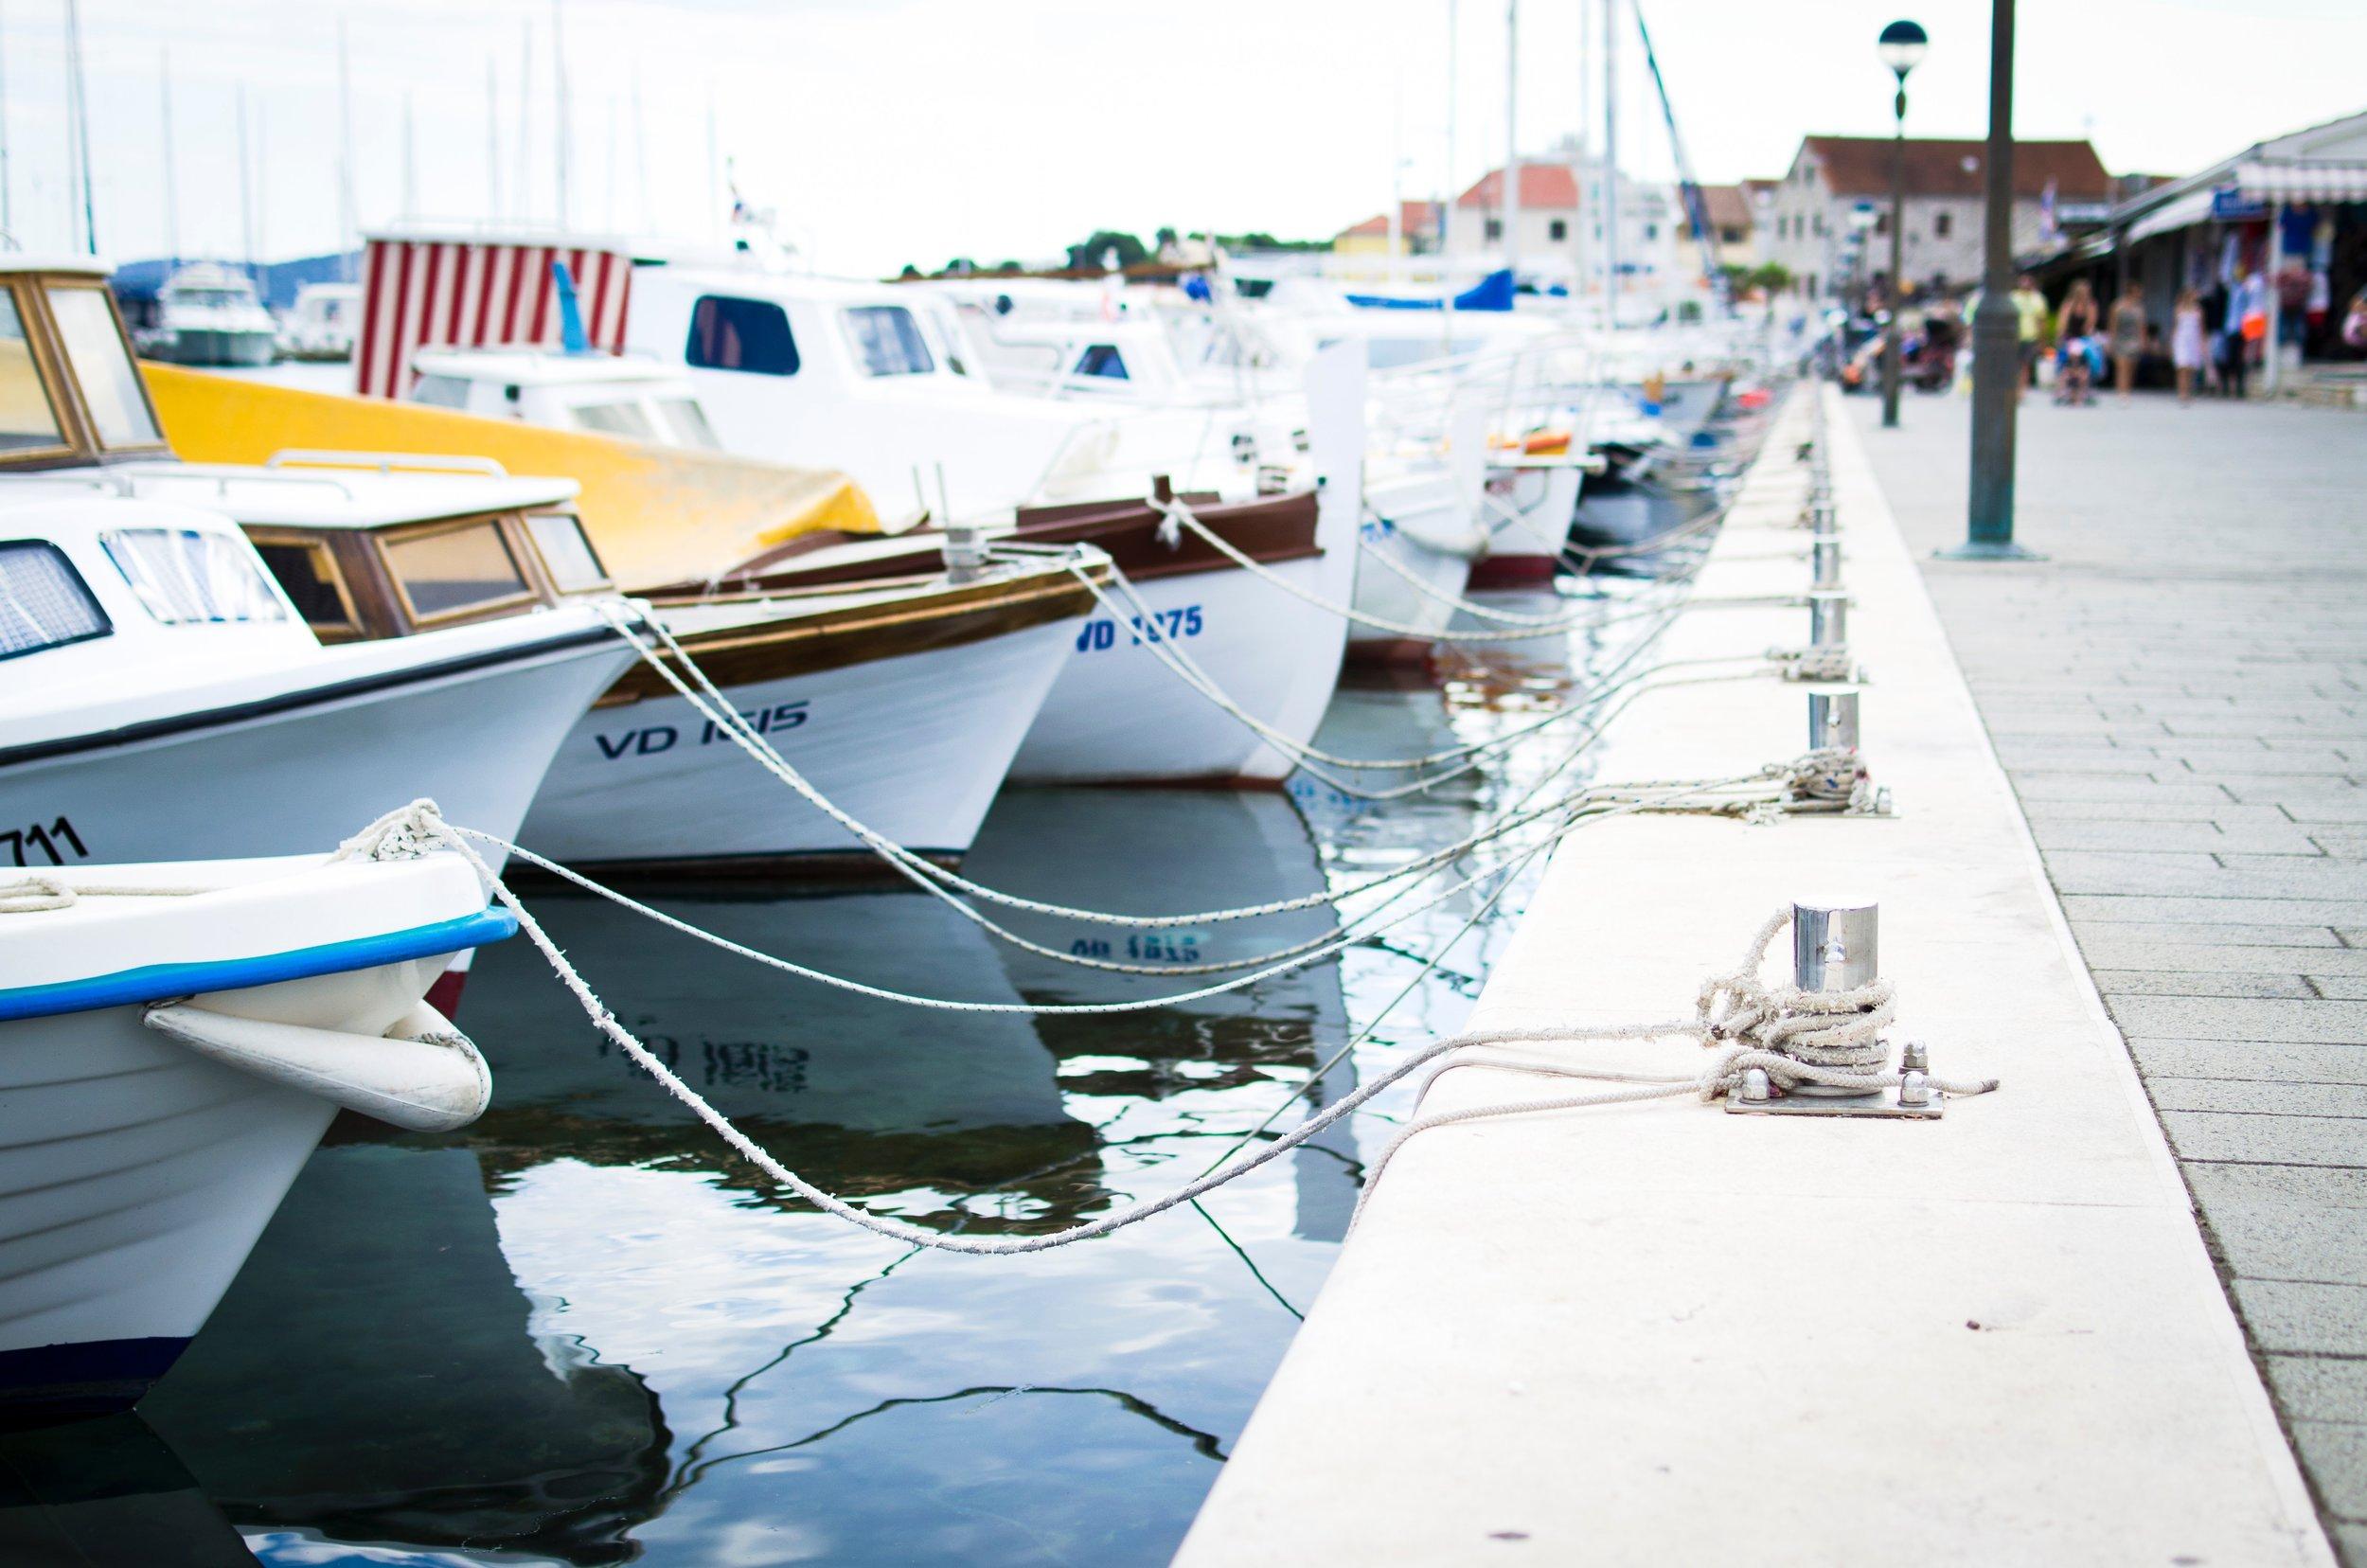 bay-blue-boat-296242.jpg